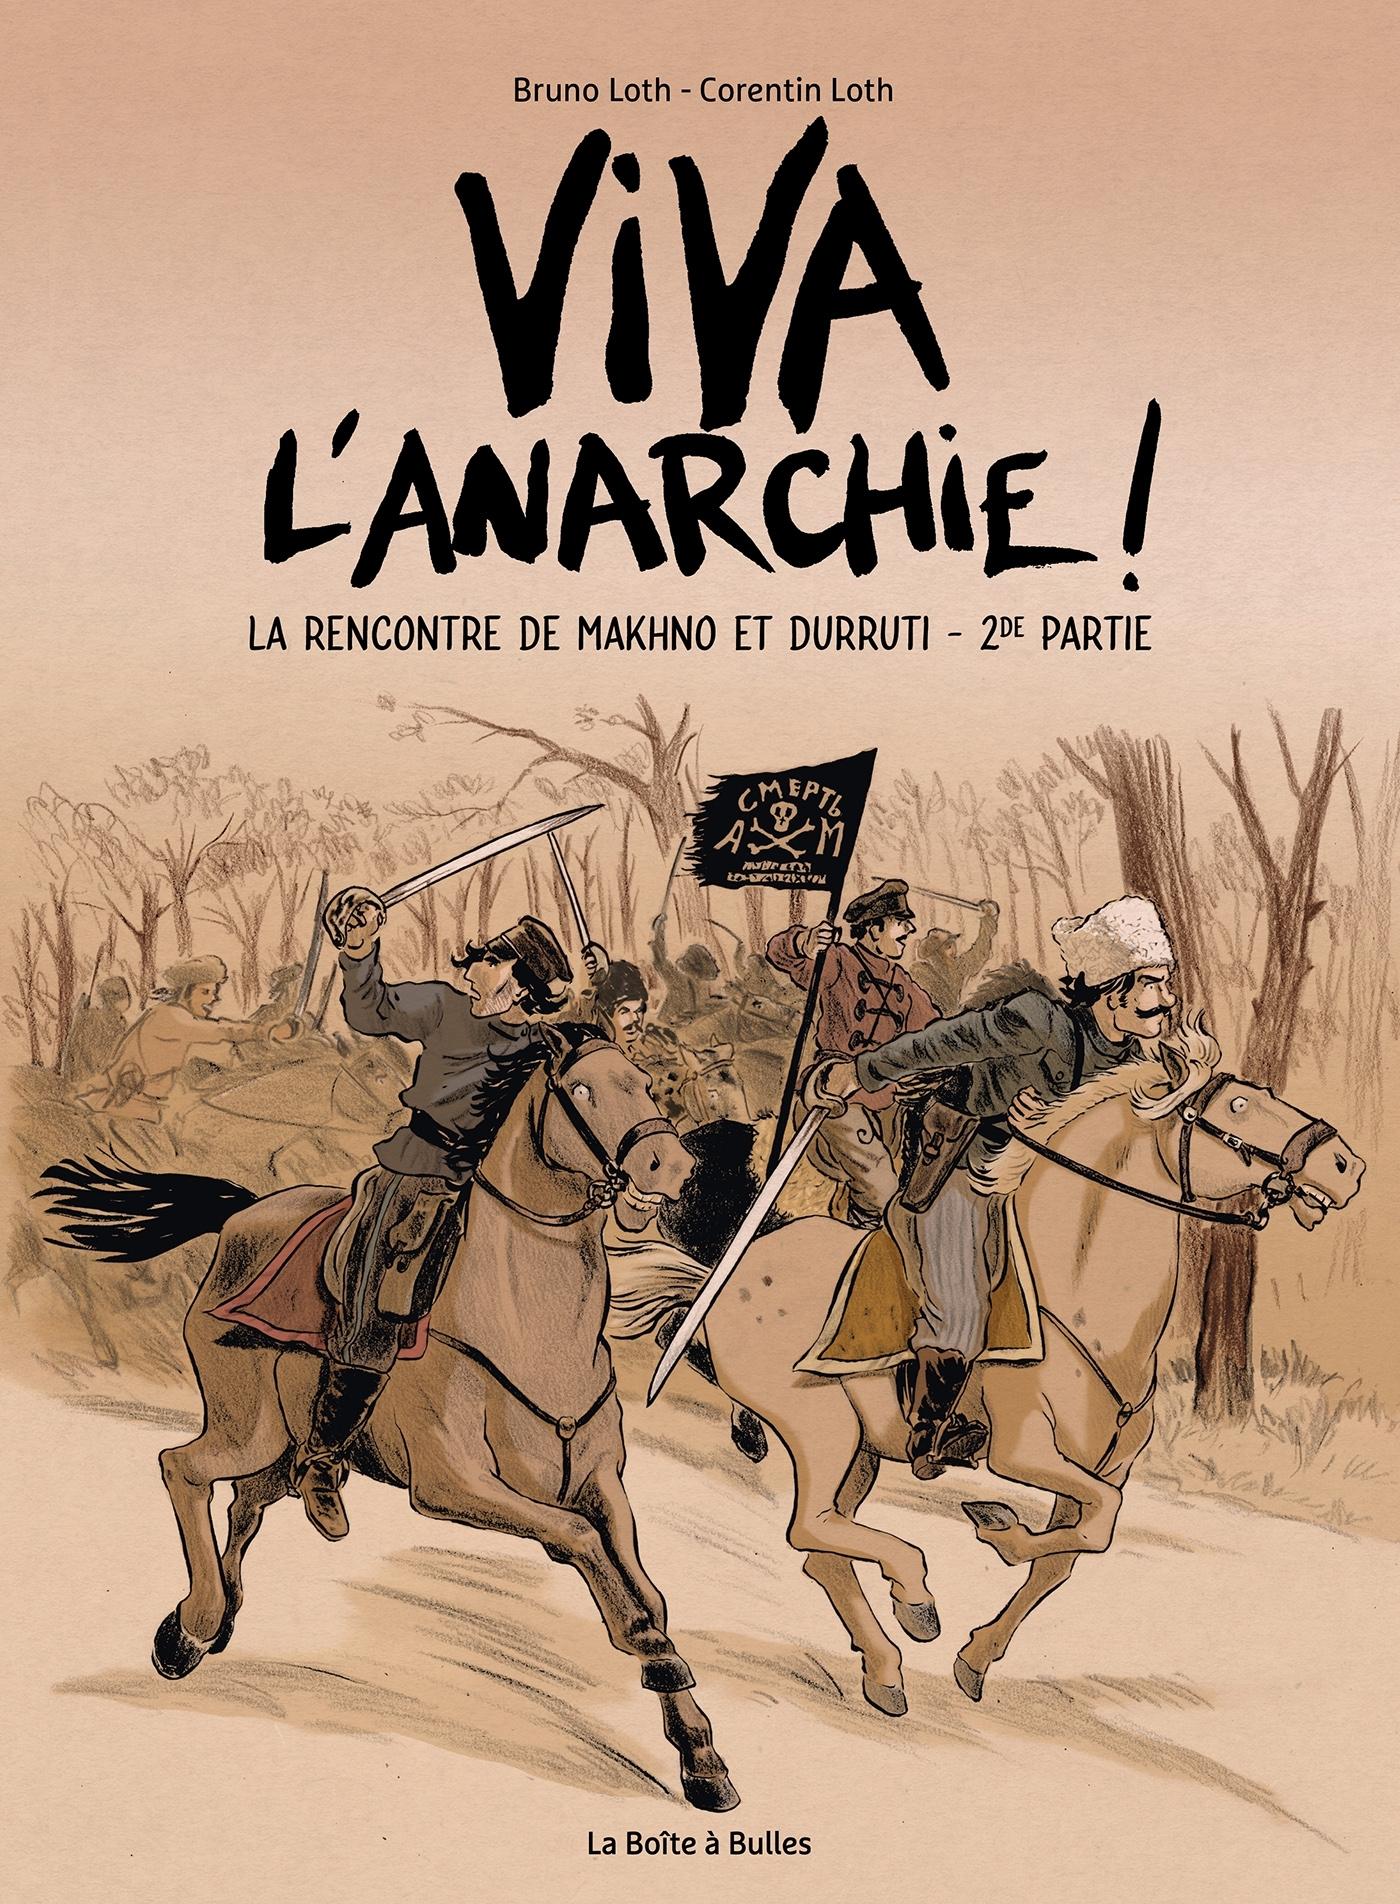 VIVA L'ANARCHIE - T02 - VIVA L'ANARCHIE ! VOL. 2